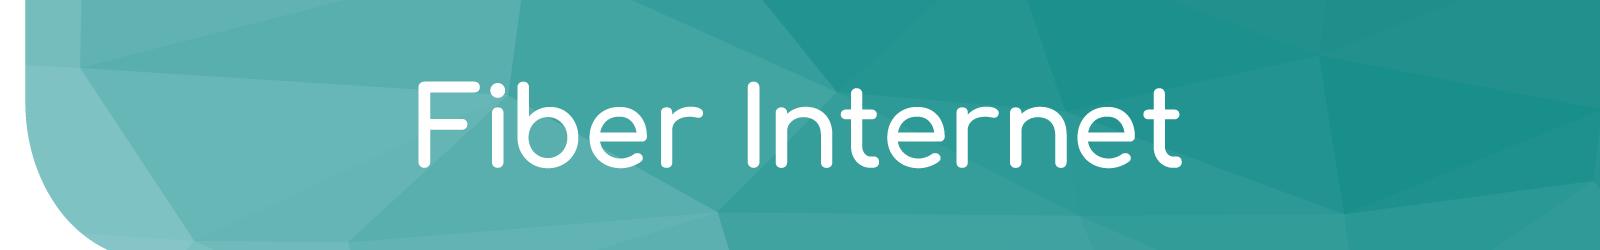 Fiber Internet - Electronic Communication Services